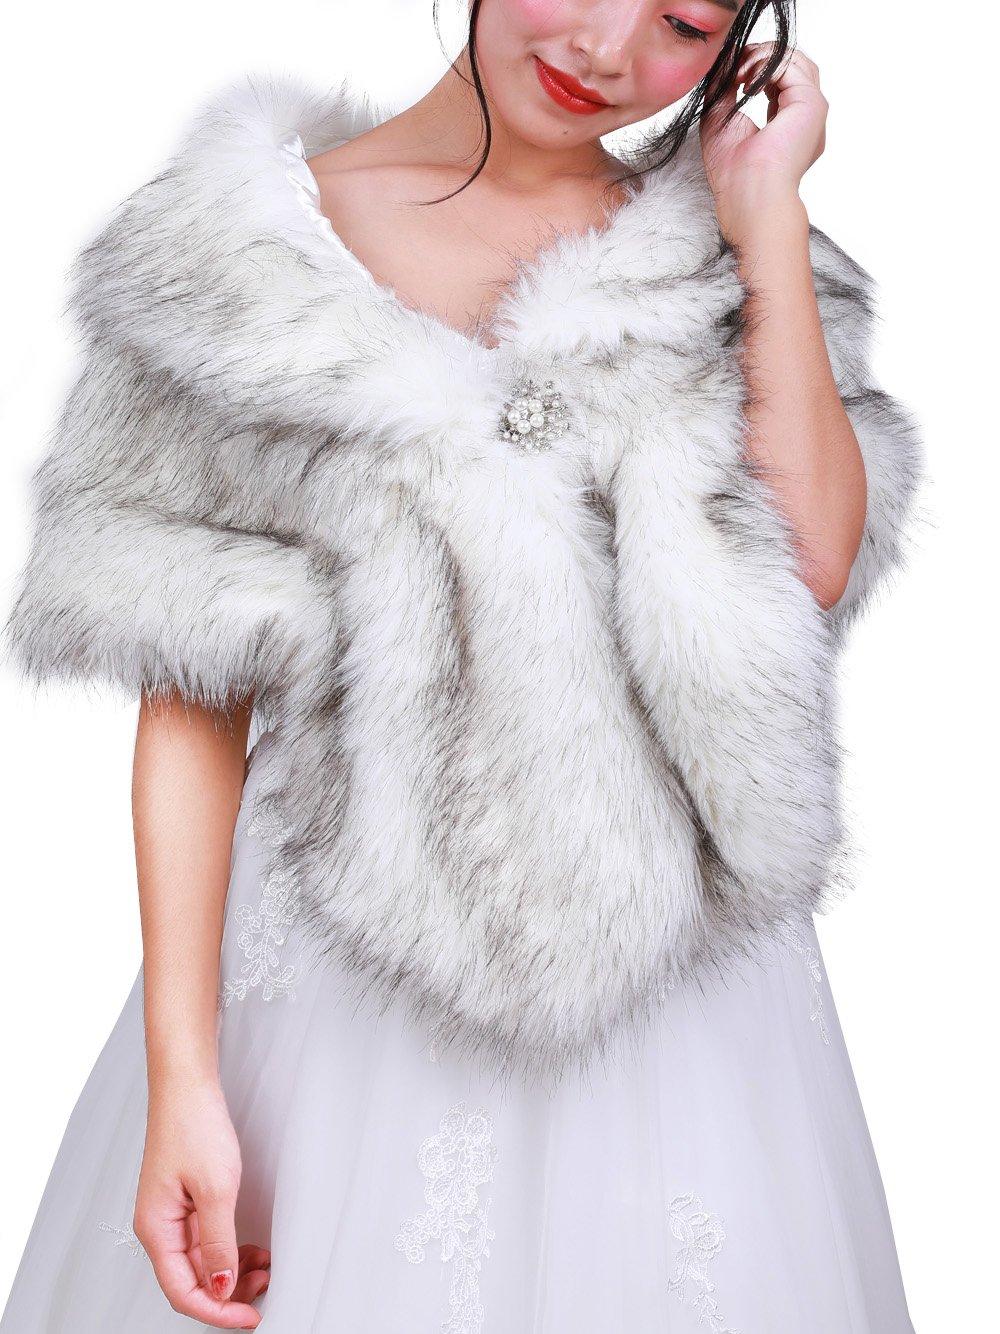 FXmimior Bridal Faux Fur Bridal Wrap Shrug Stole Shawl Cape Wedding Faux Fur Wrap (gray&white)